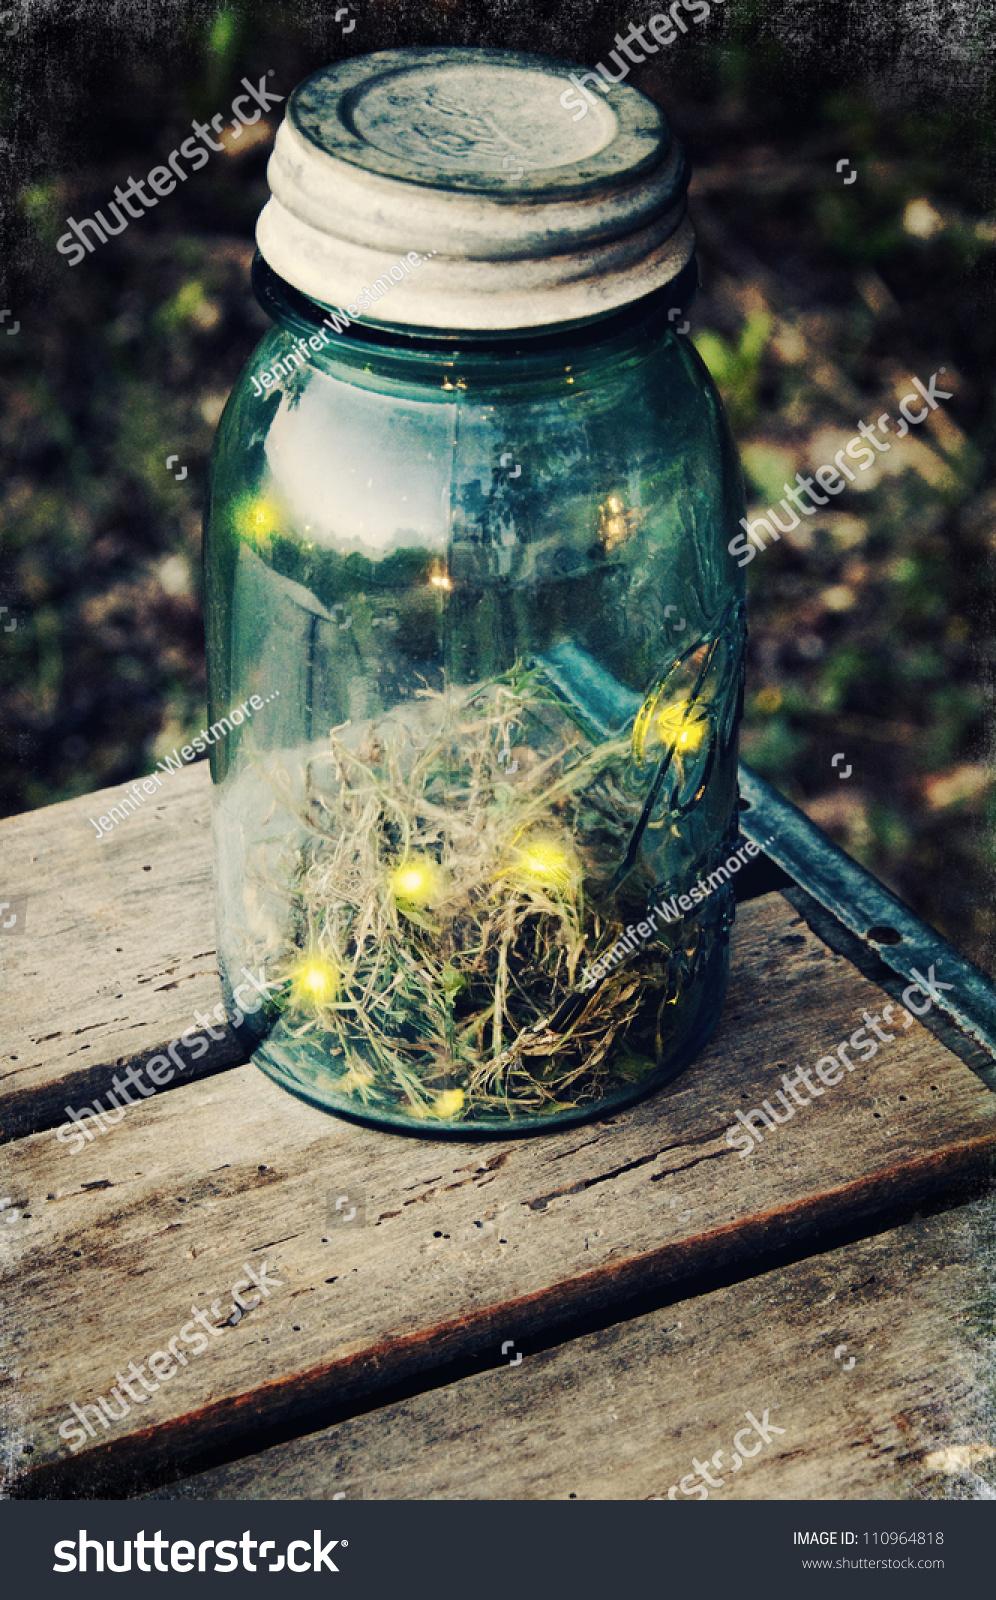 fireflies in a jar stock photo 110964818 shutterstock. Black Bedroom Furniture Sets. Home Design Ideas